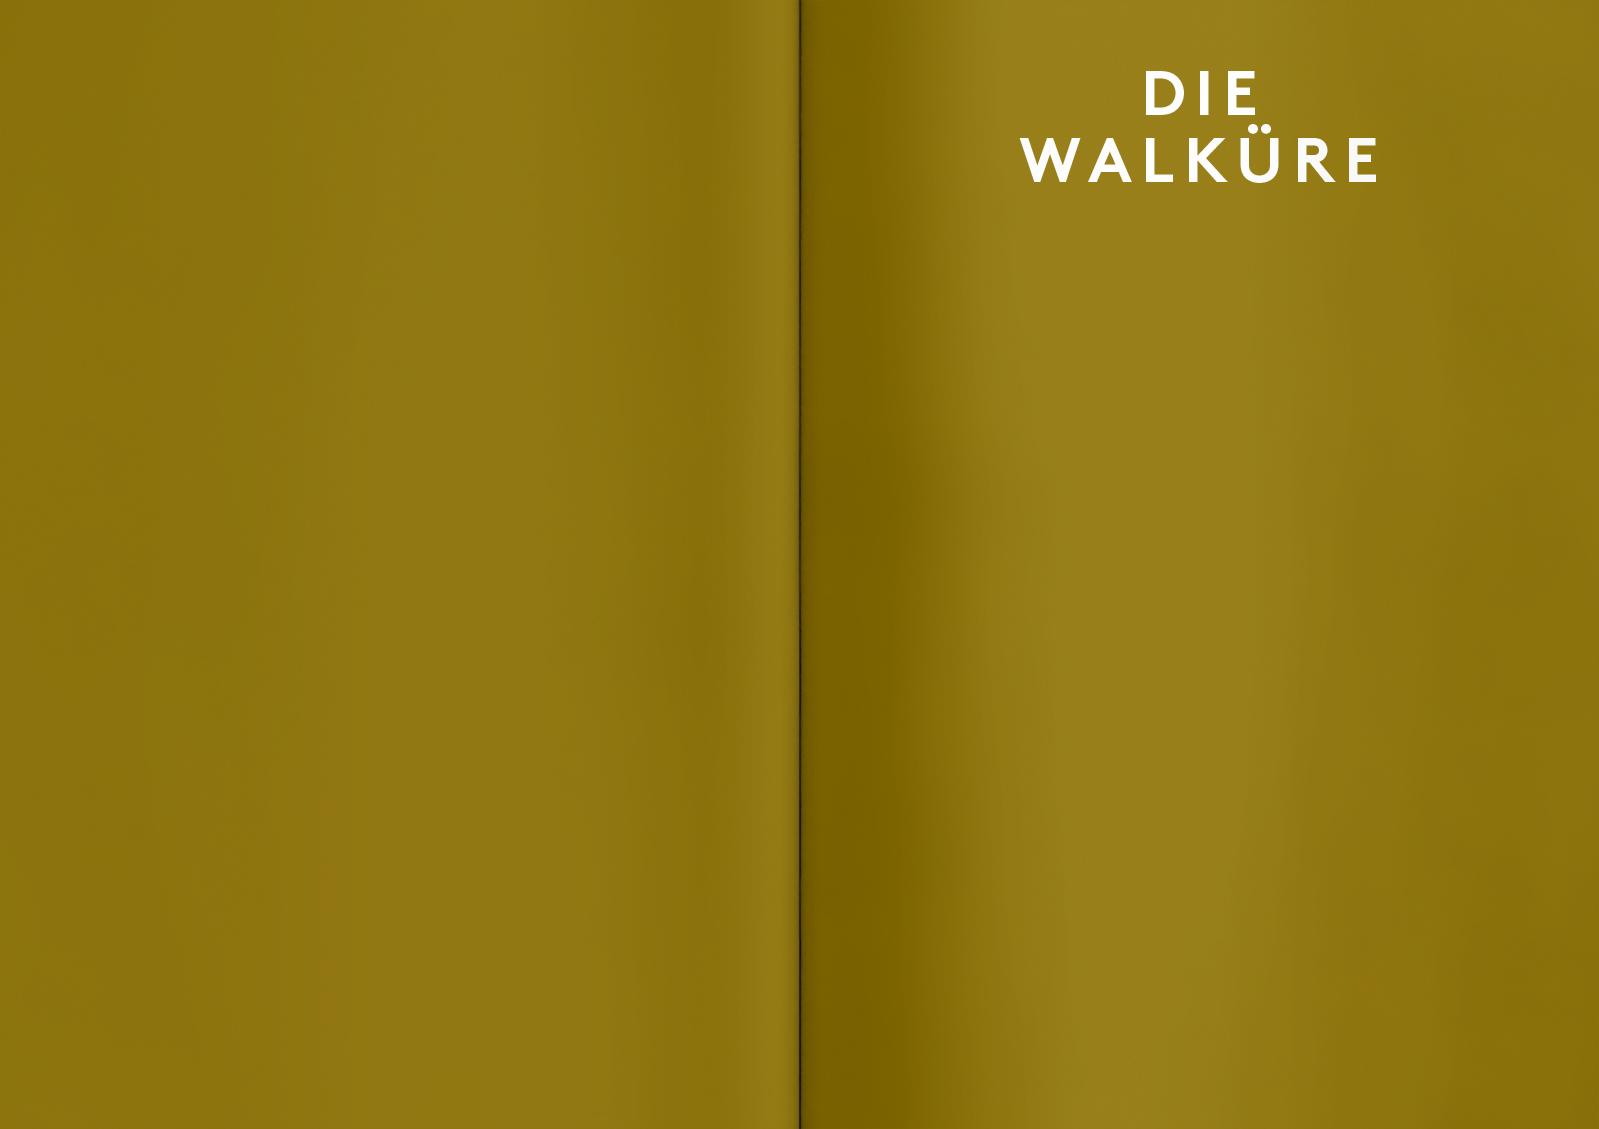 Kuefner spread04